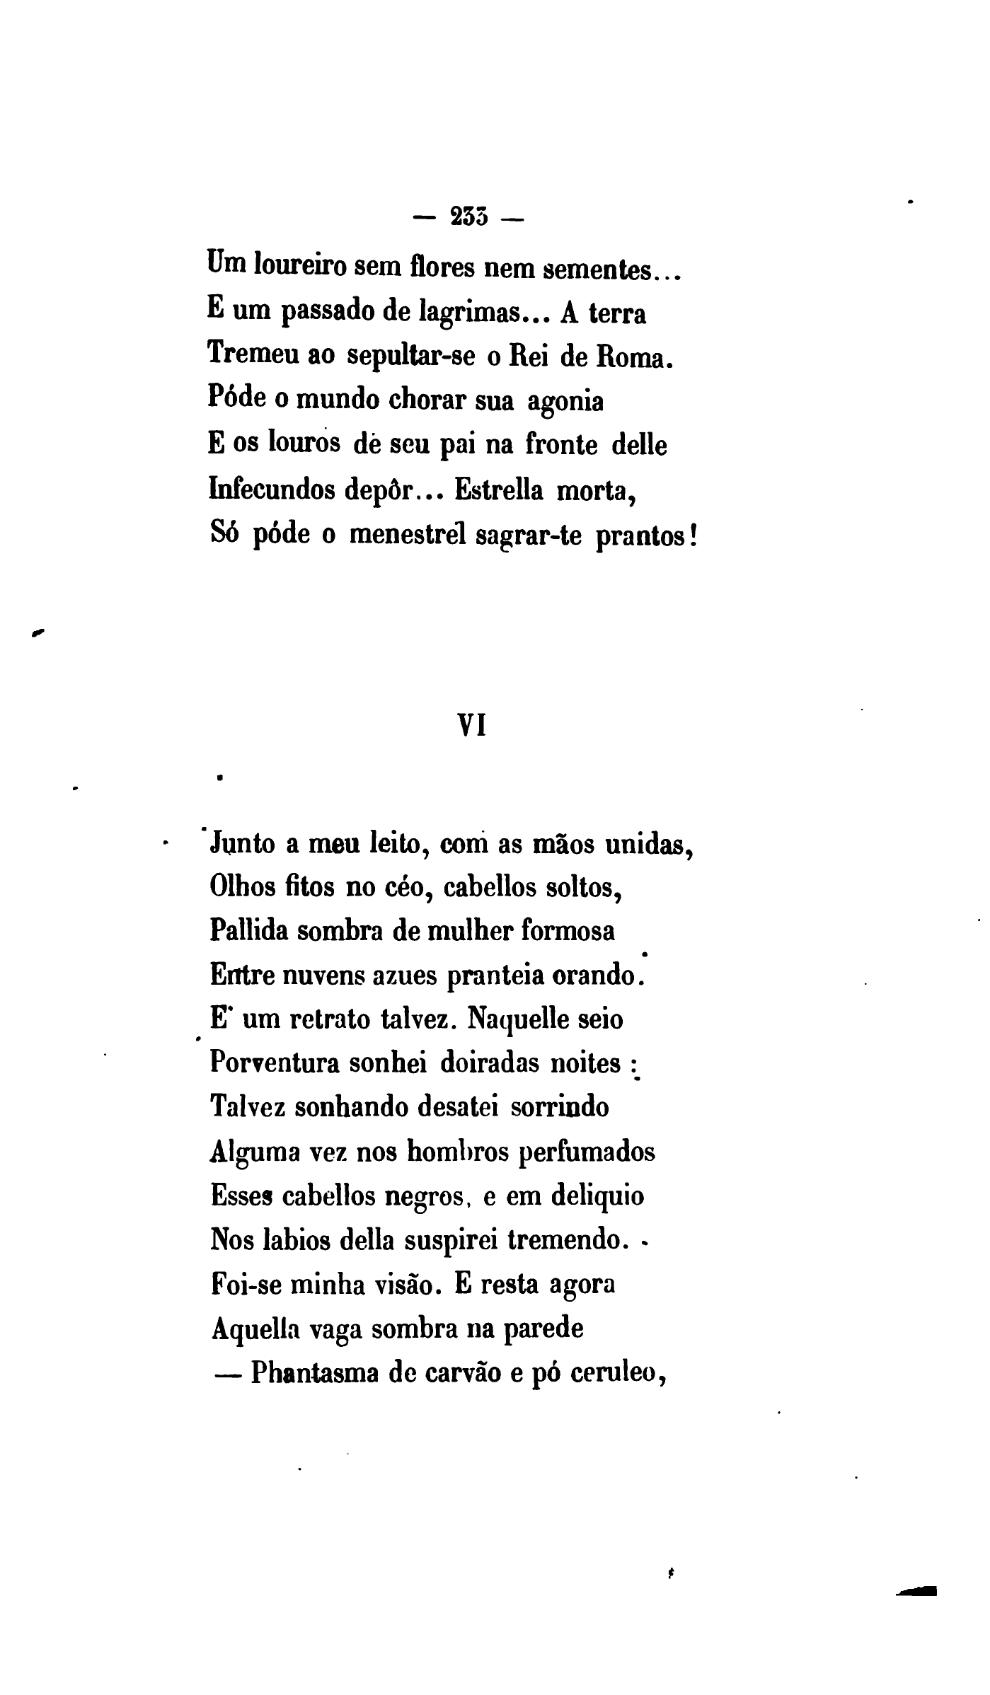 Pagina Obras De Manoel Antonio Alvares De Azevedo V1 Djvu 243